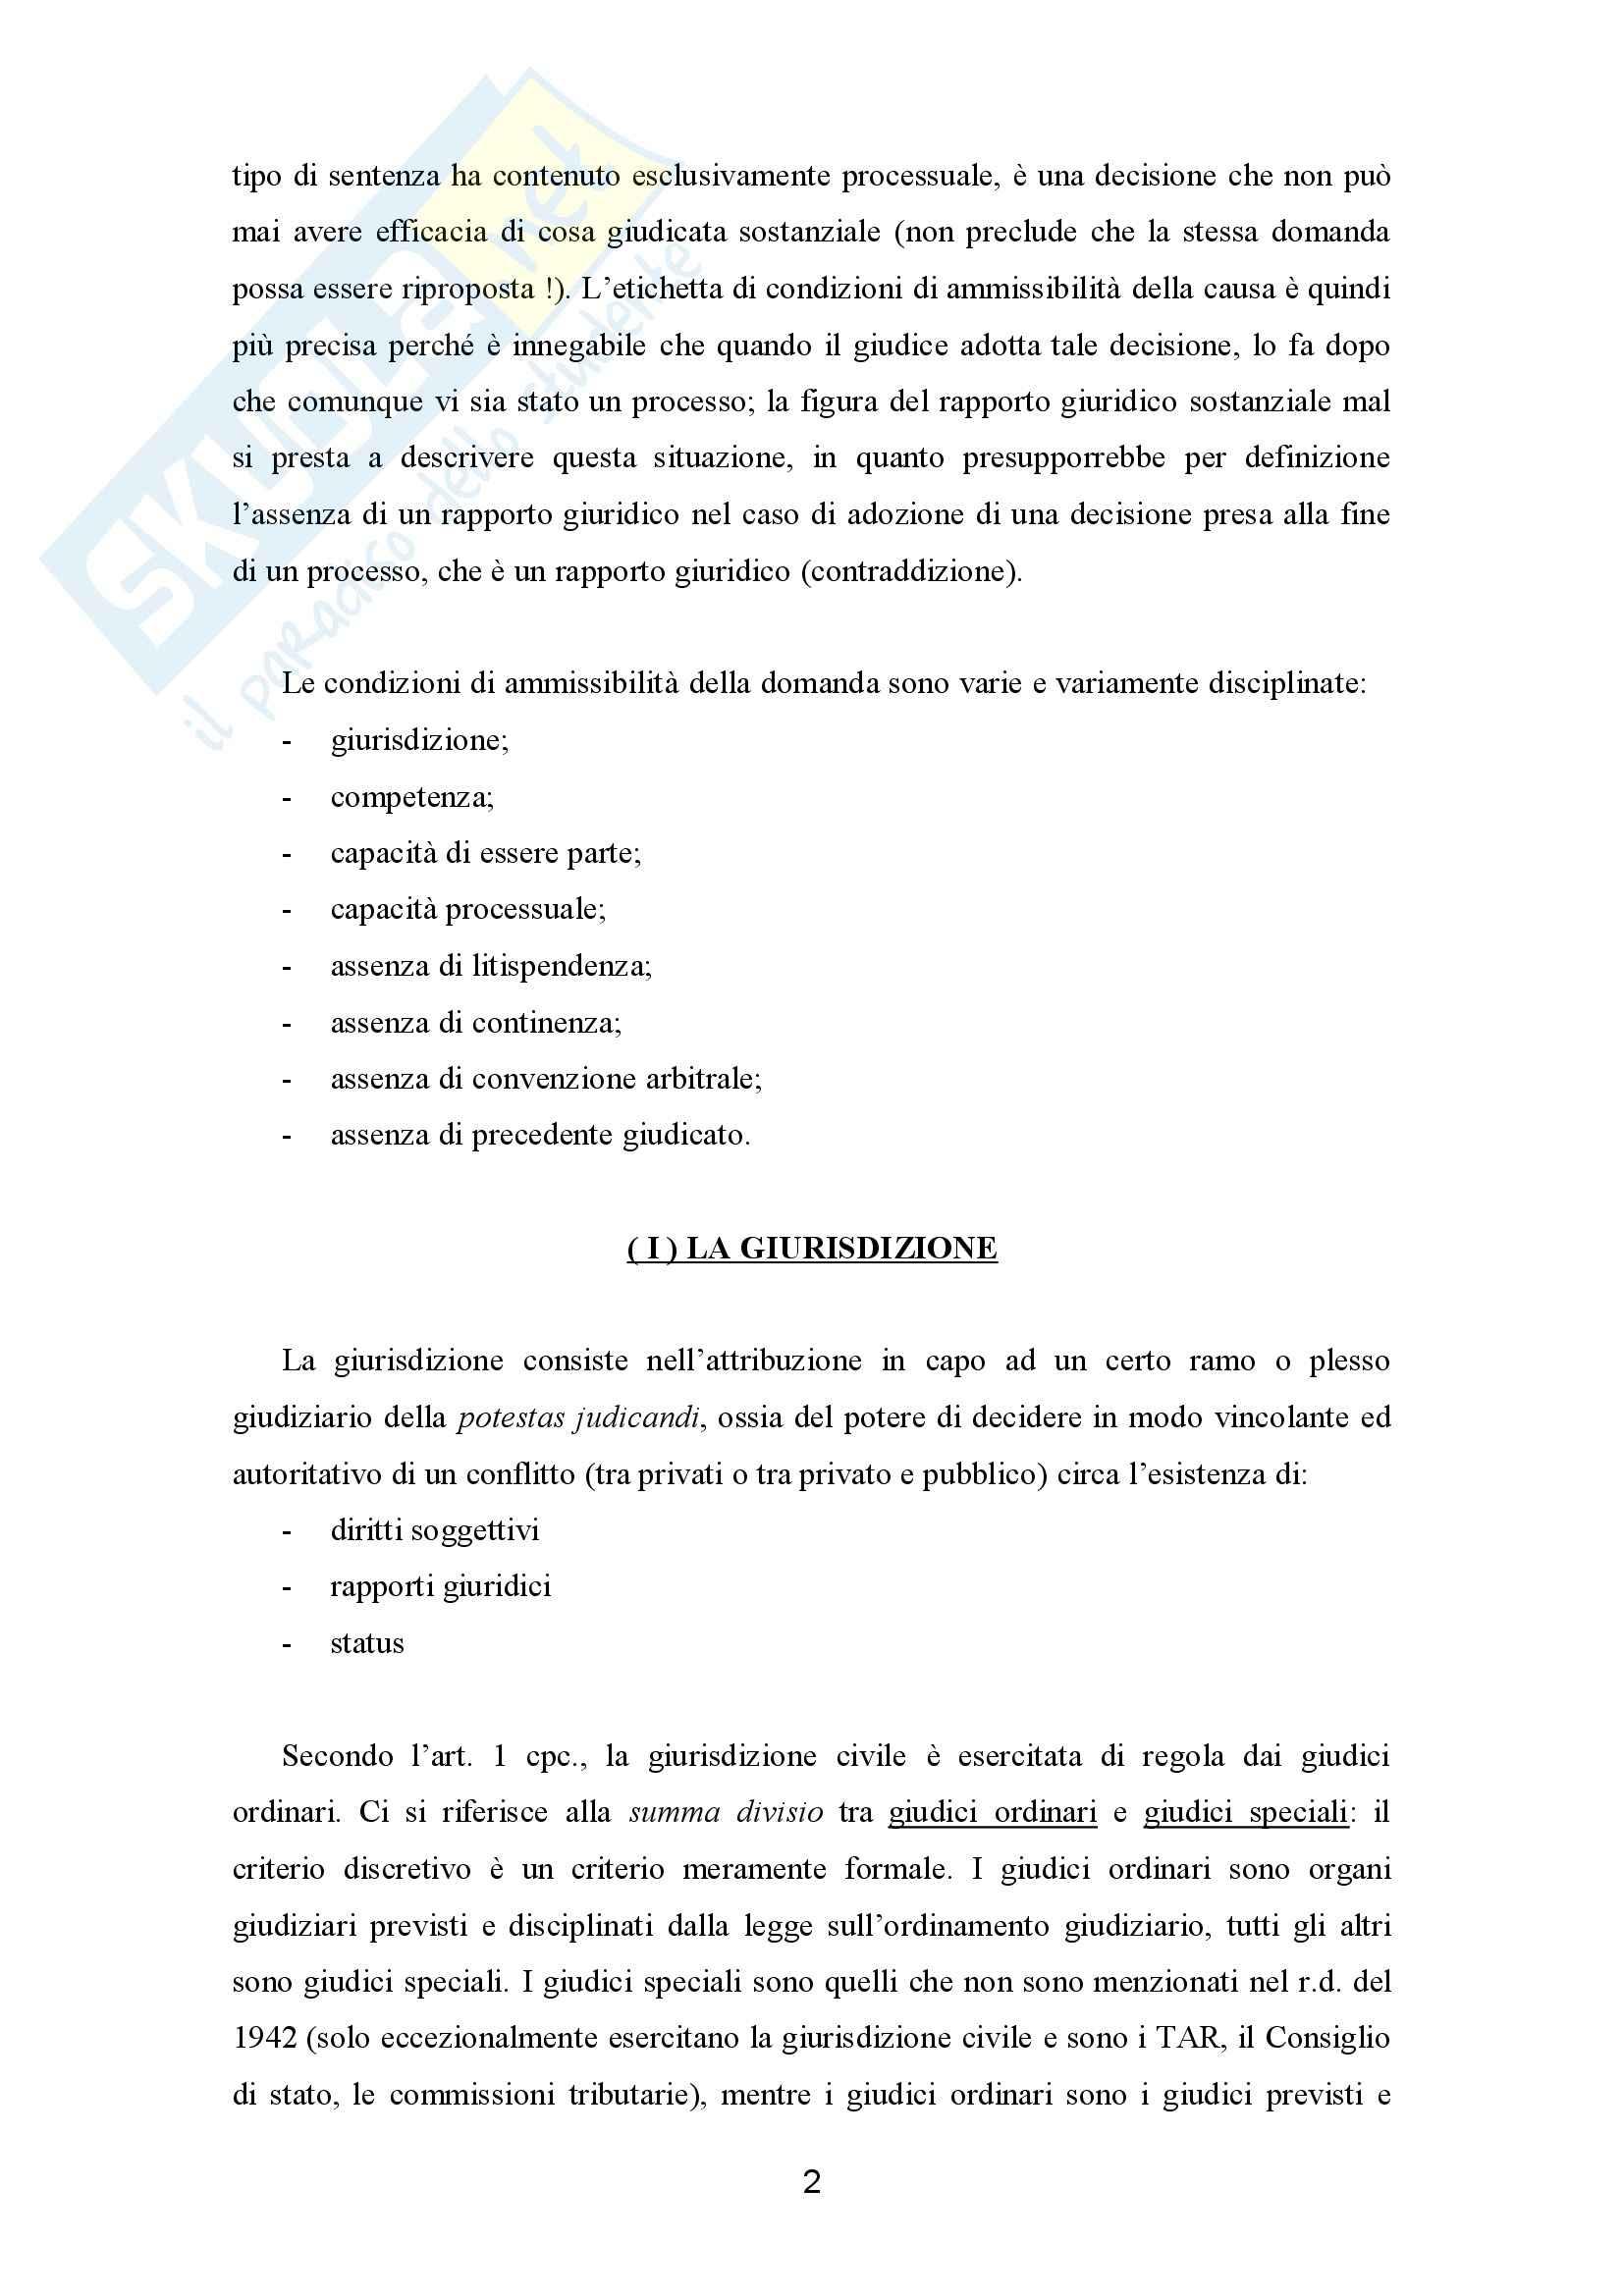 Presupposti processuali Pag. 2